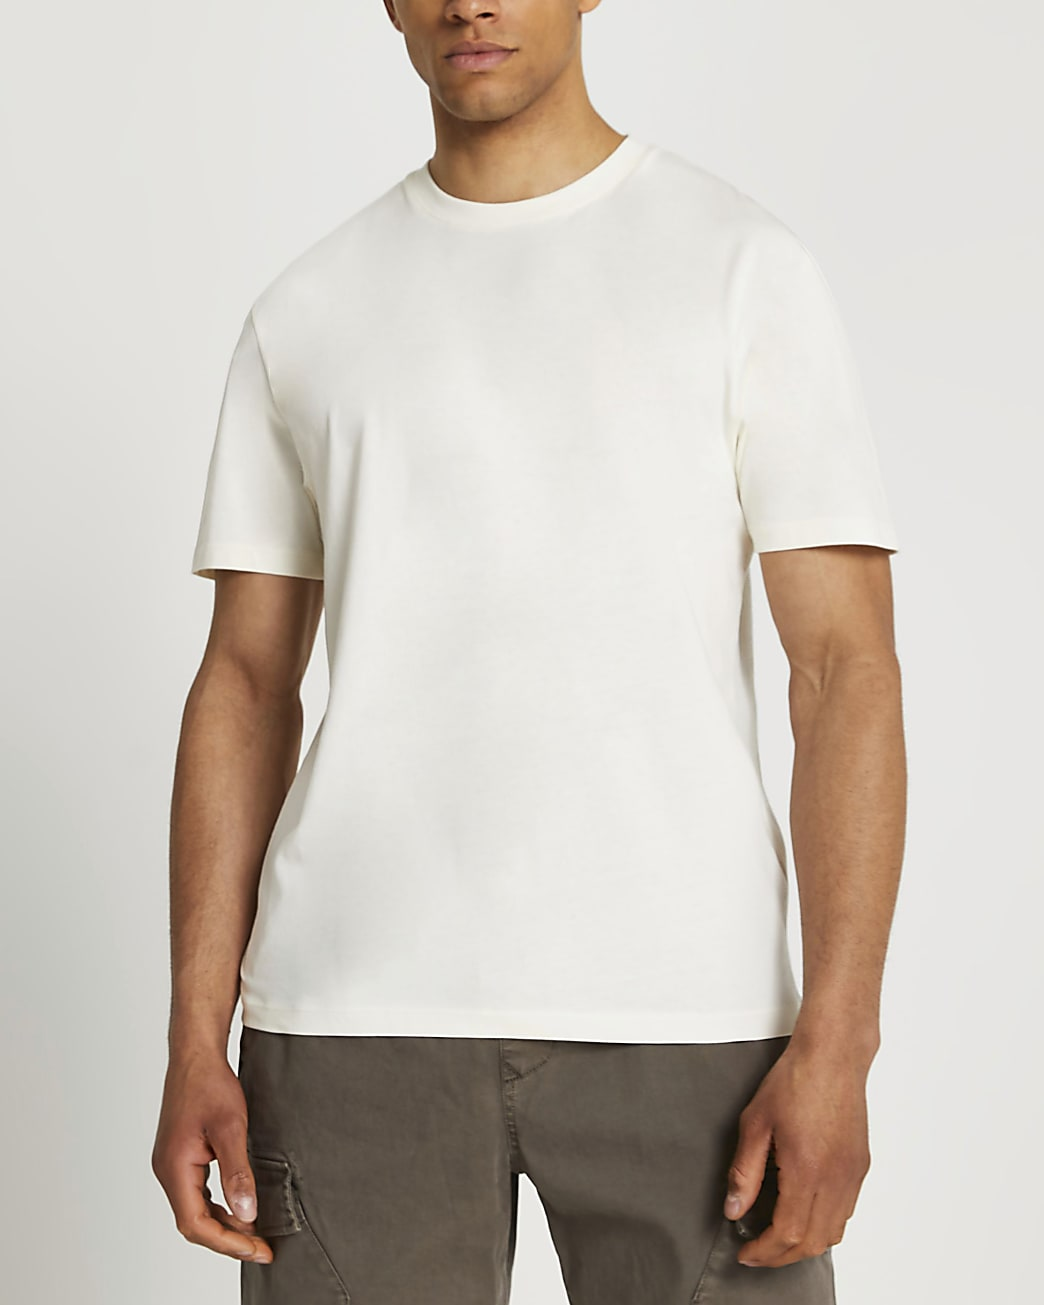 Ecru oversized fit tonal circle print t-shirt